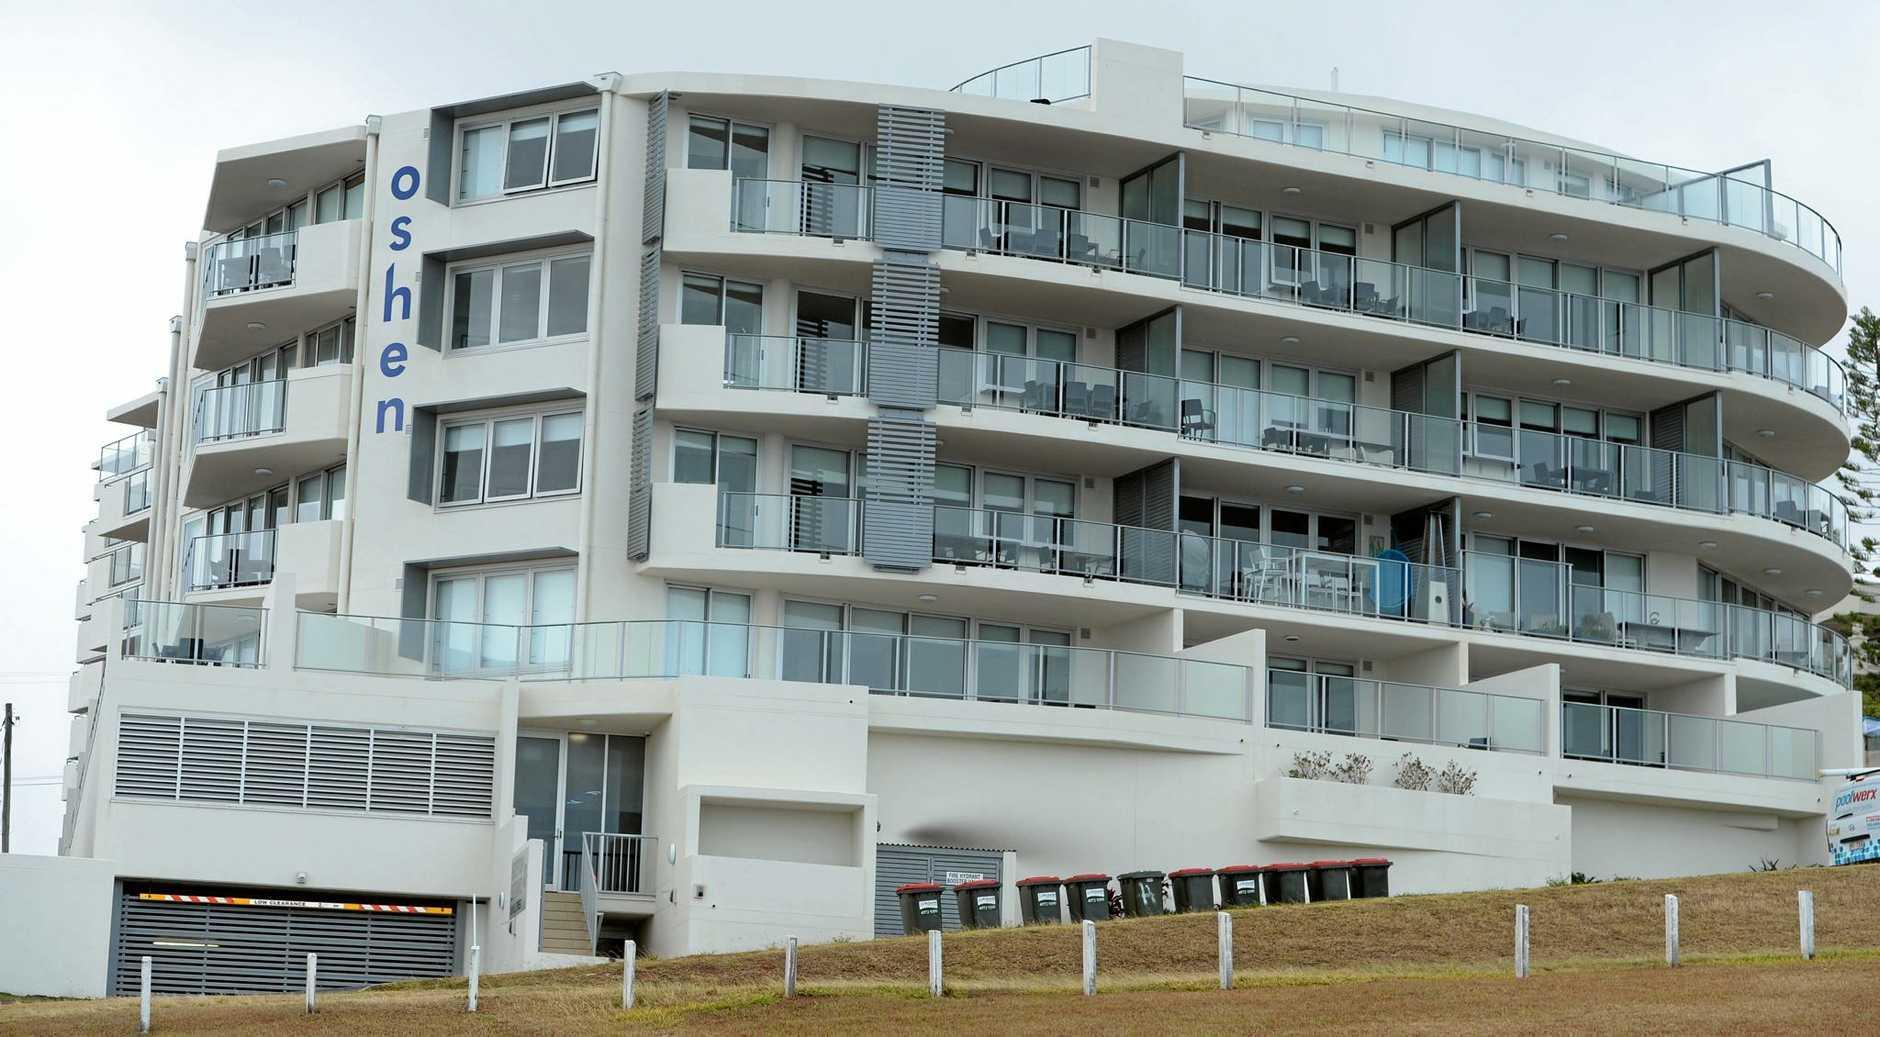 Oshen Apartments Yeppoon.   Photo: Chris Ison / The Morning Bulletin